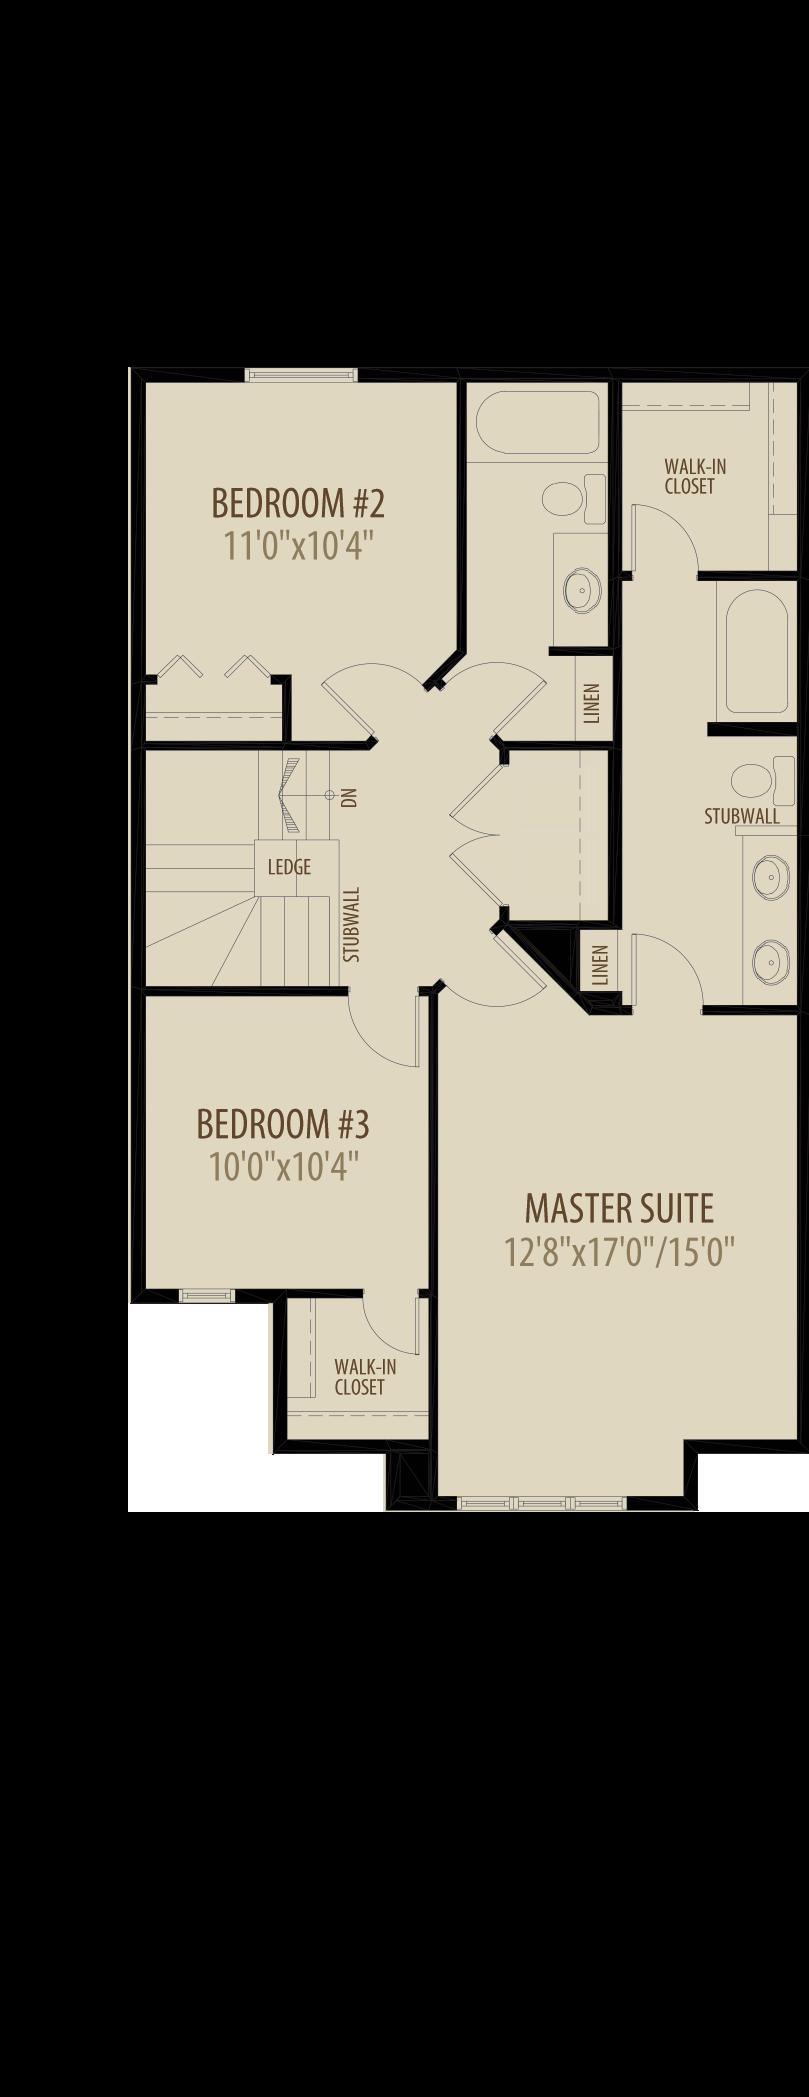 Extended Upper Floor adds 57 sq ft